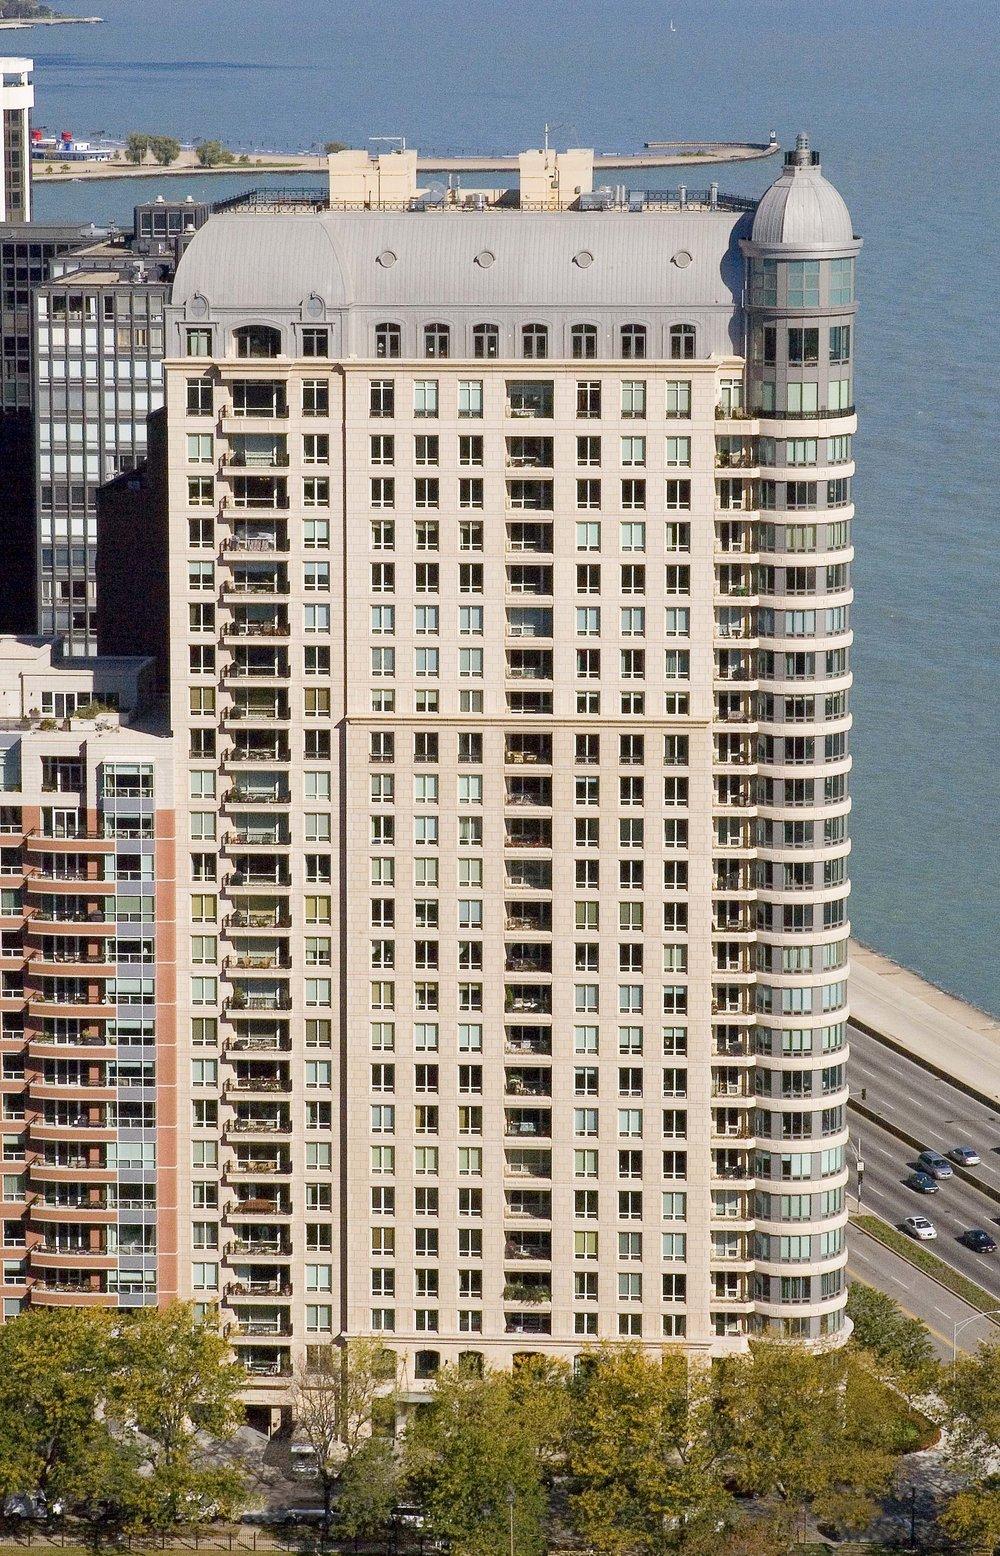 840 North Lake Shore Drive   840 North Lake Shore Drive  Chicago, Illinois    More information